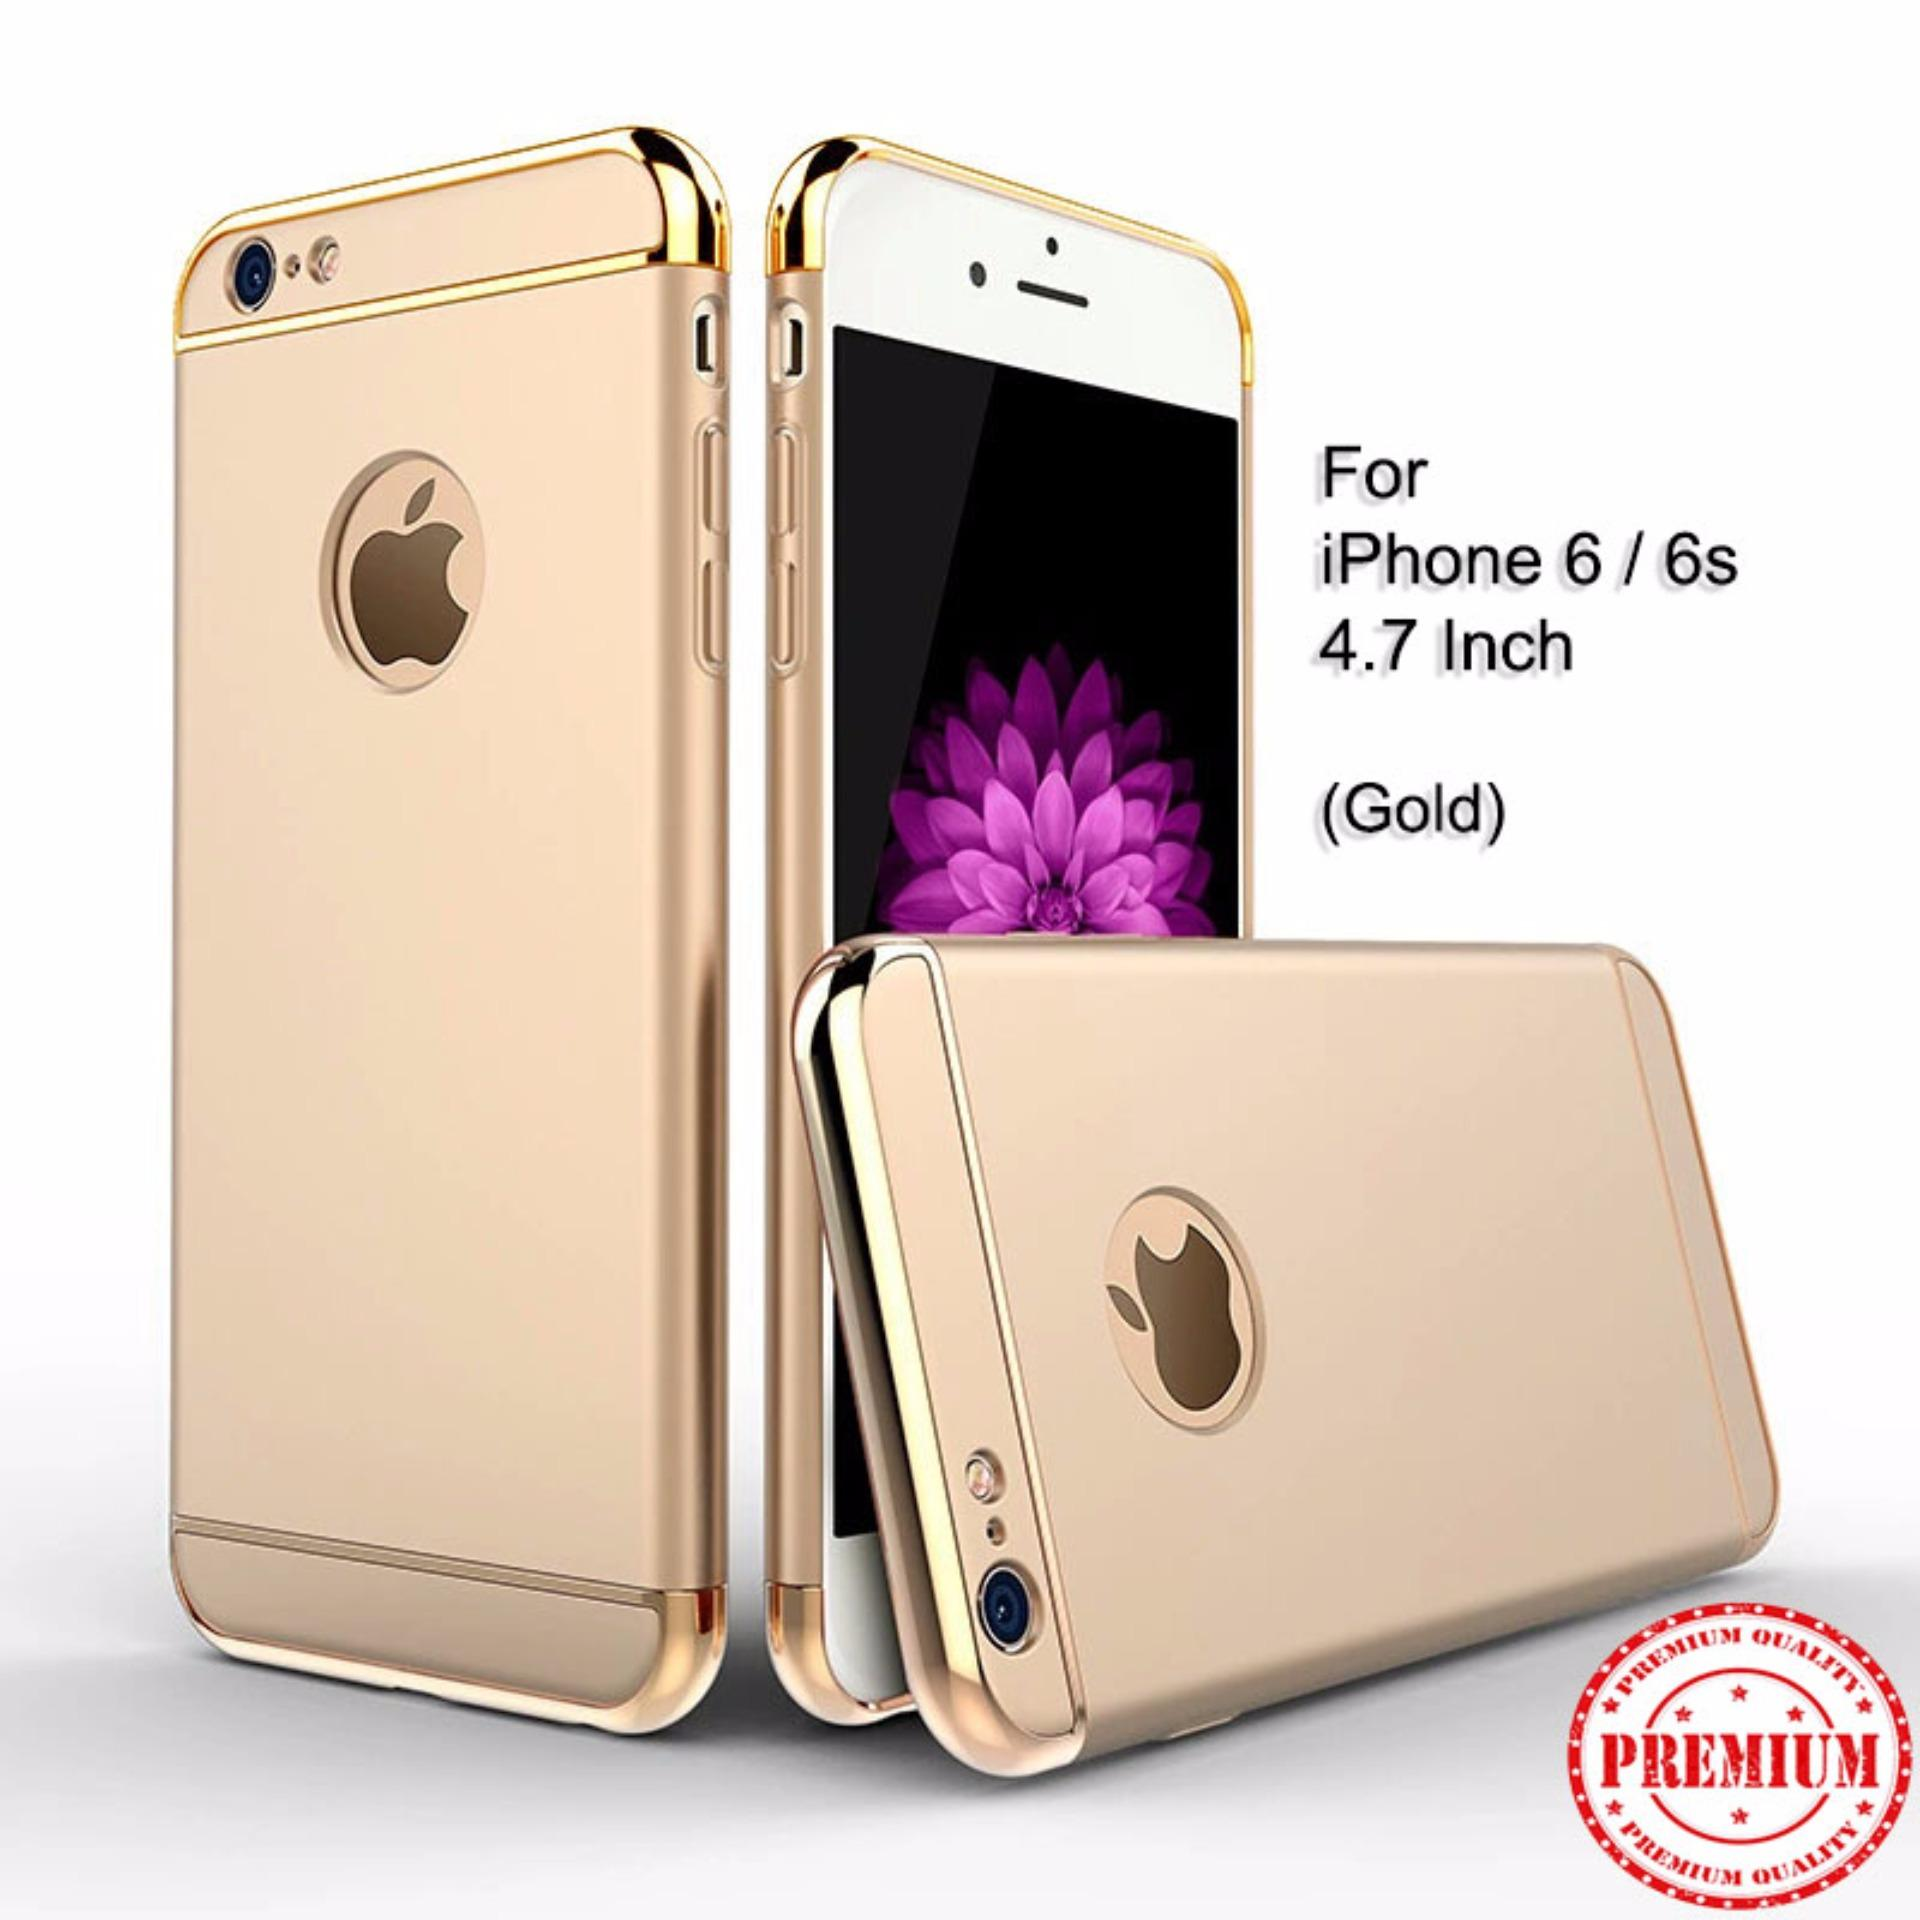 ... Xiaomi Redmi Note 3 / Pro / Prime versi. Source · Calandiva Premium Quality Elegance Protection Hardcase for Iphone 6 6s 4 7 Inch Gold Lazada Indonesia